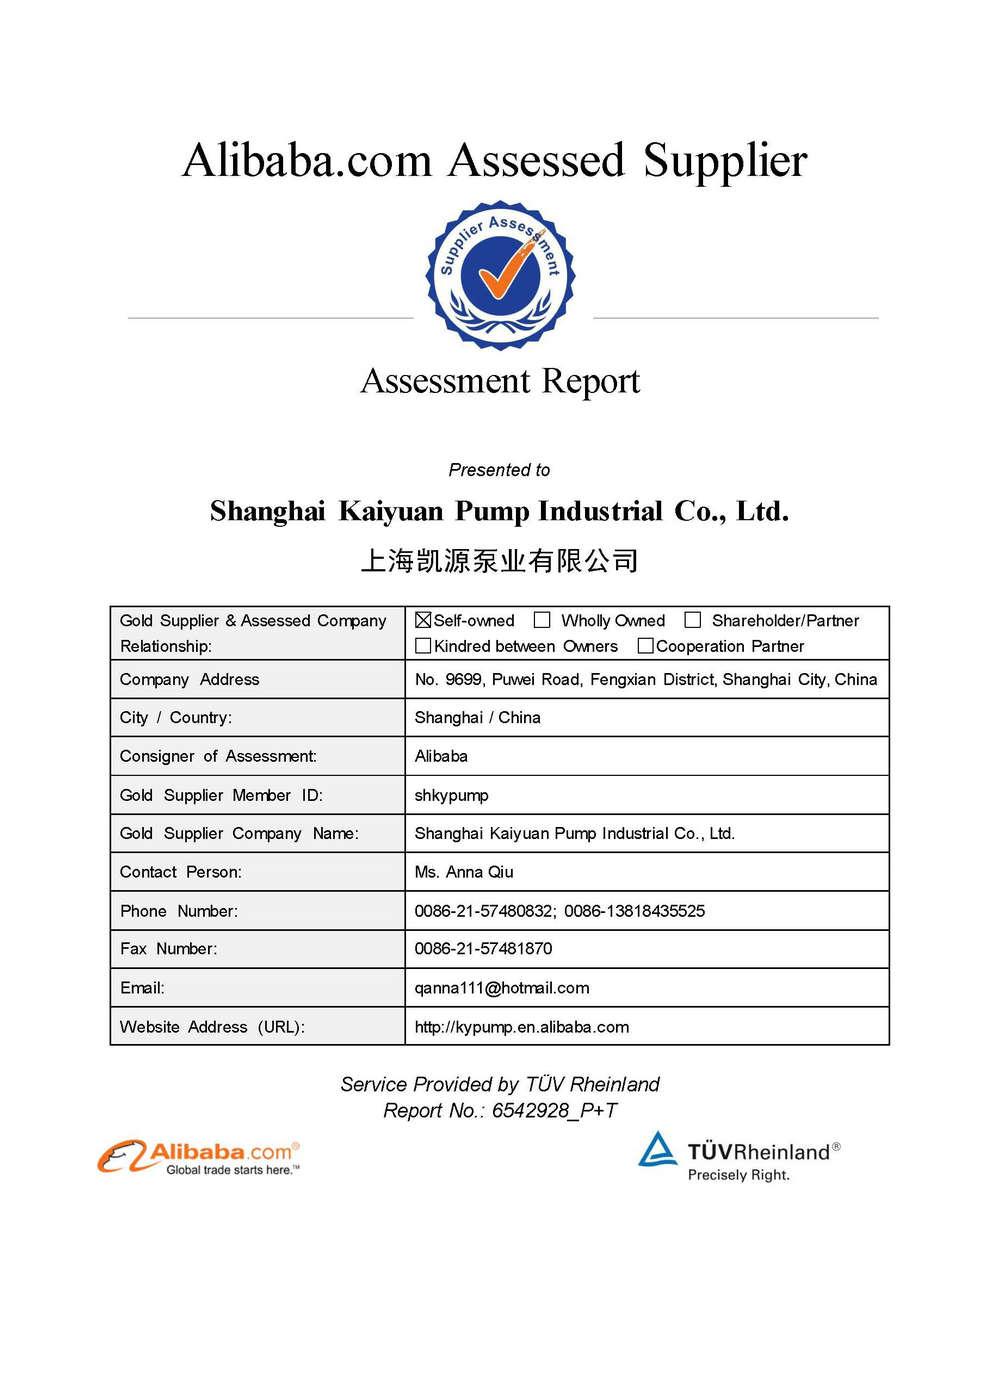 Company Verification By TUV Rheinland - Shanghai Kaiyuan Pump